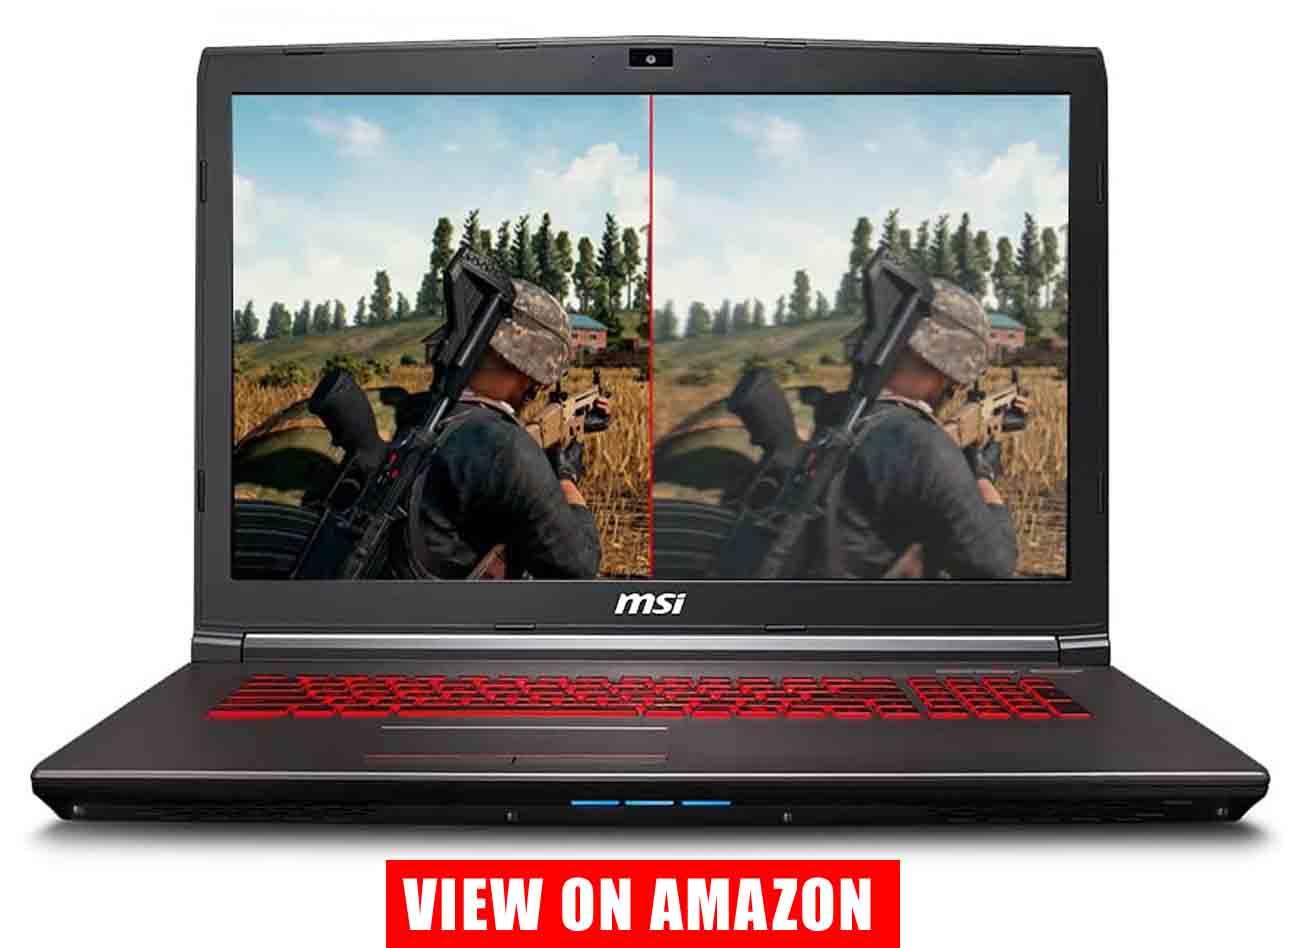 MSI GV72 Thin and Light Gaming Laptop